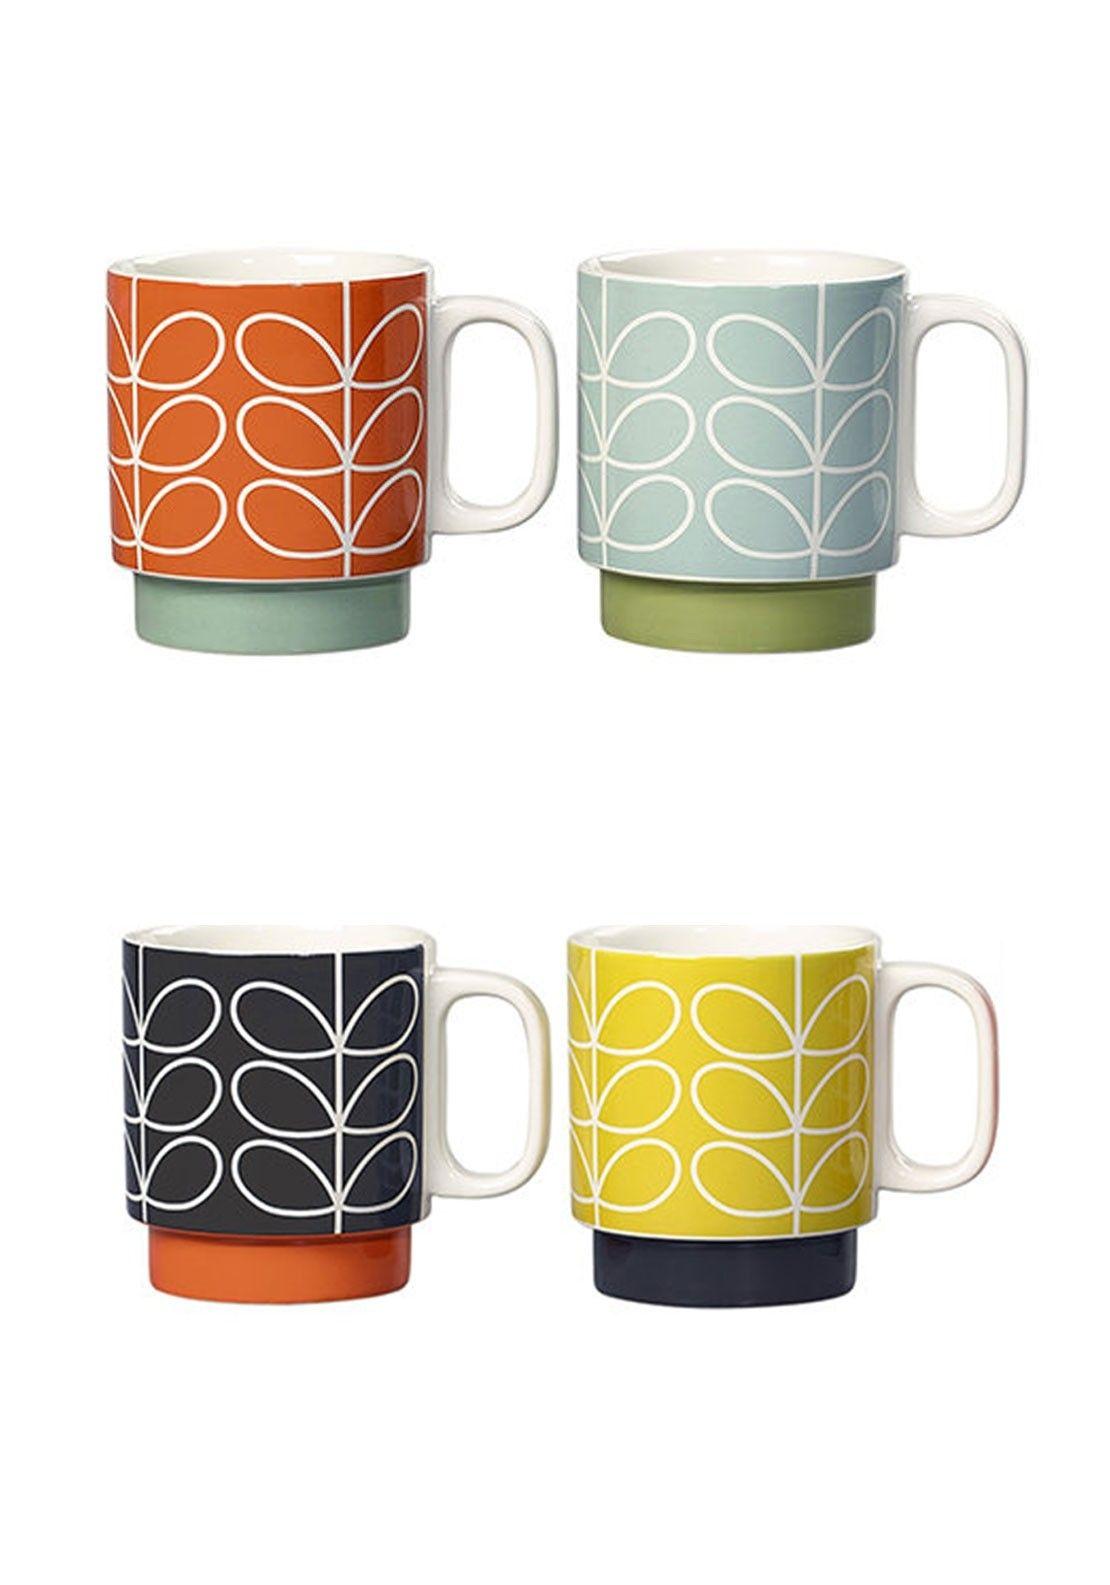 Orla Kiely Ceramic Stacking Mugs Set Of 4 Mcelhinneys Mugs Set Mugs Ceramic Mugs